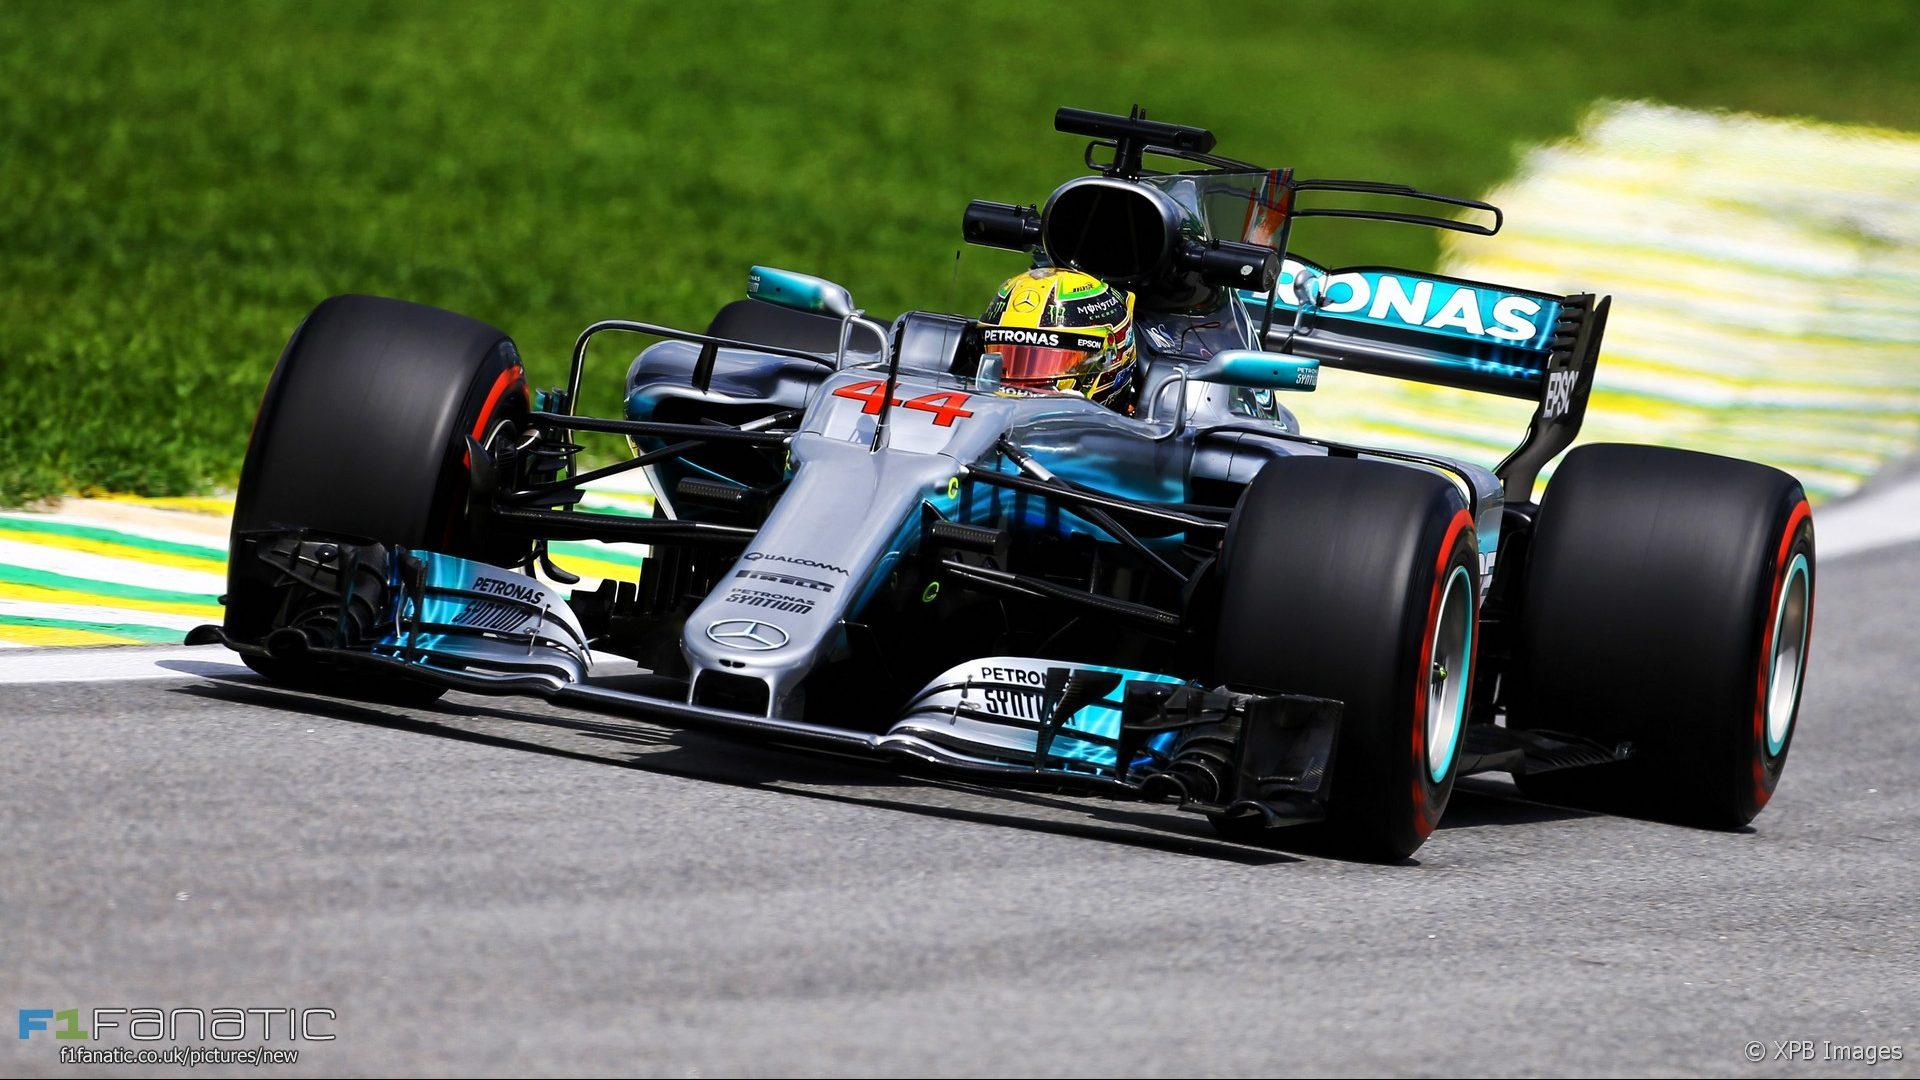 Auto & Motorrad: Teile Ford Sauber Racing Team F1 Formula1 Red Bull Klassiker Edel